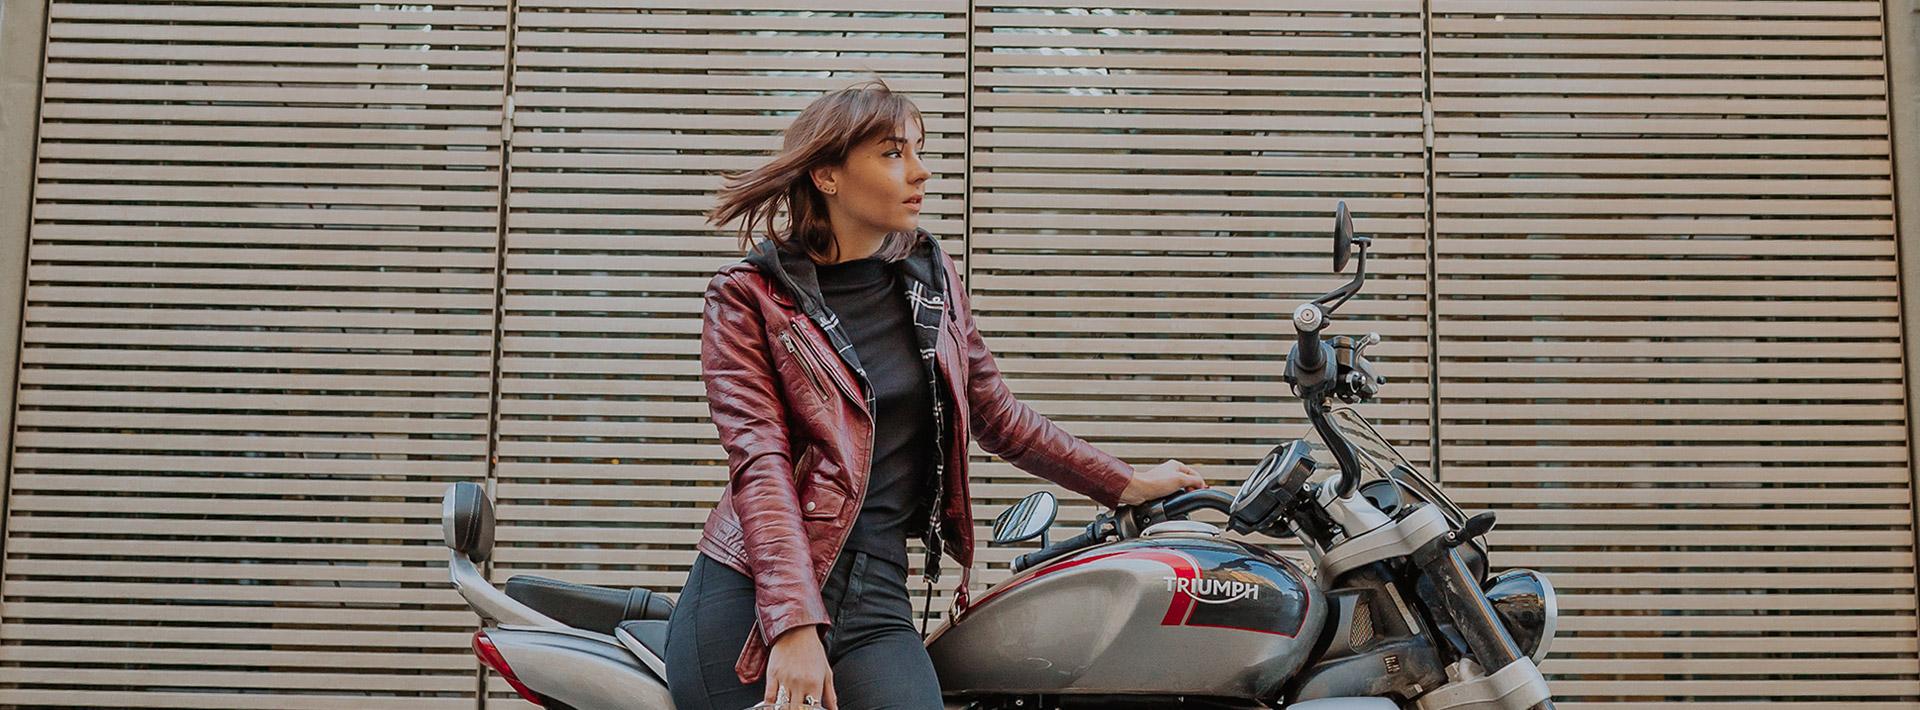 Julie (a.k.a @mrs.babe.rider) shows that biking & that freedom feeling belong to the women's world, thx.